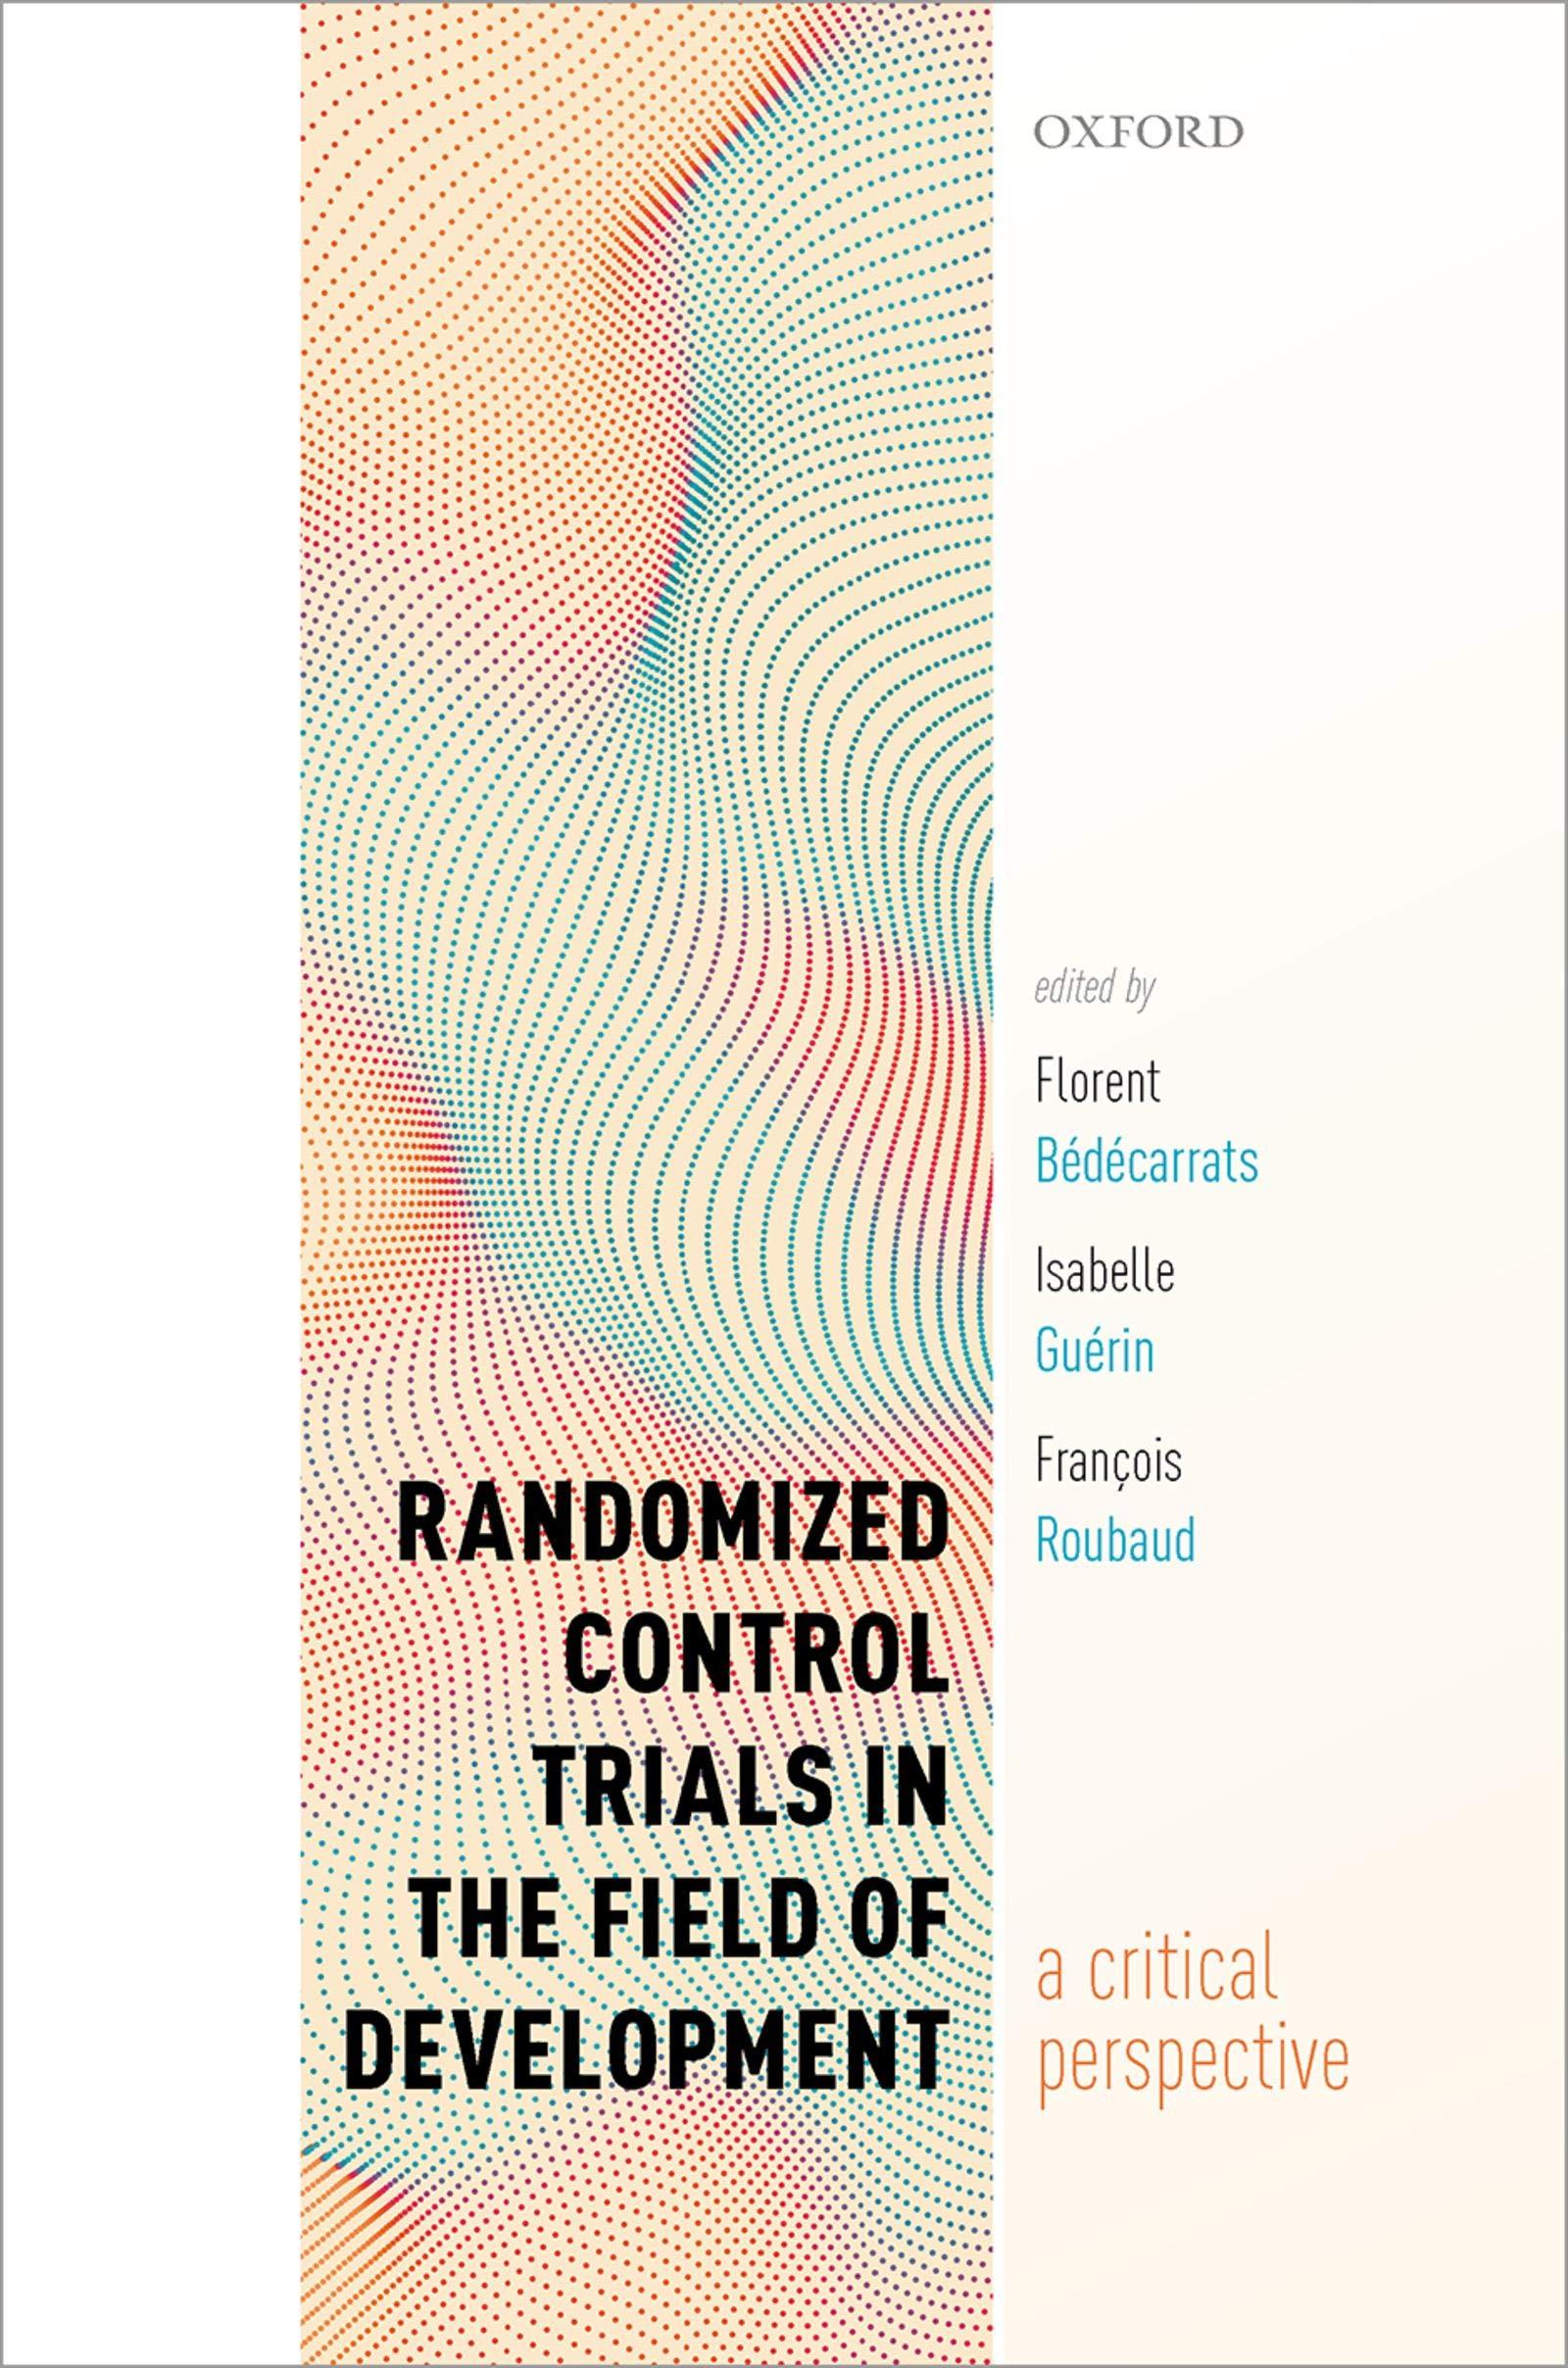 Amazon.com: Randomized Control Trials in the Field of Development: A  Critical Perspective eBook: Bédécarrats, Florent, Guérin, Isabelle,  Roubaud, François: Kindle Store